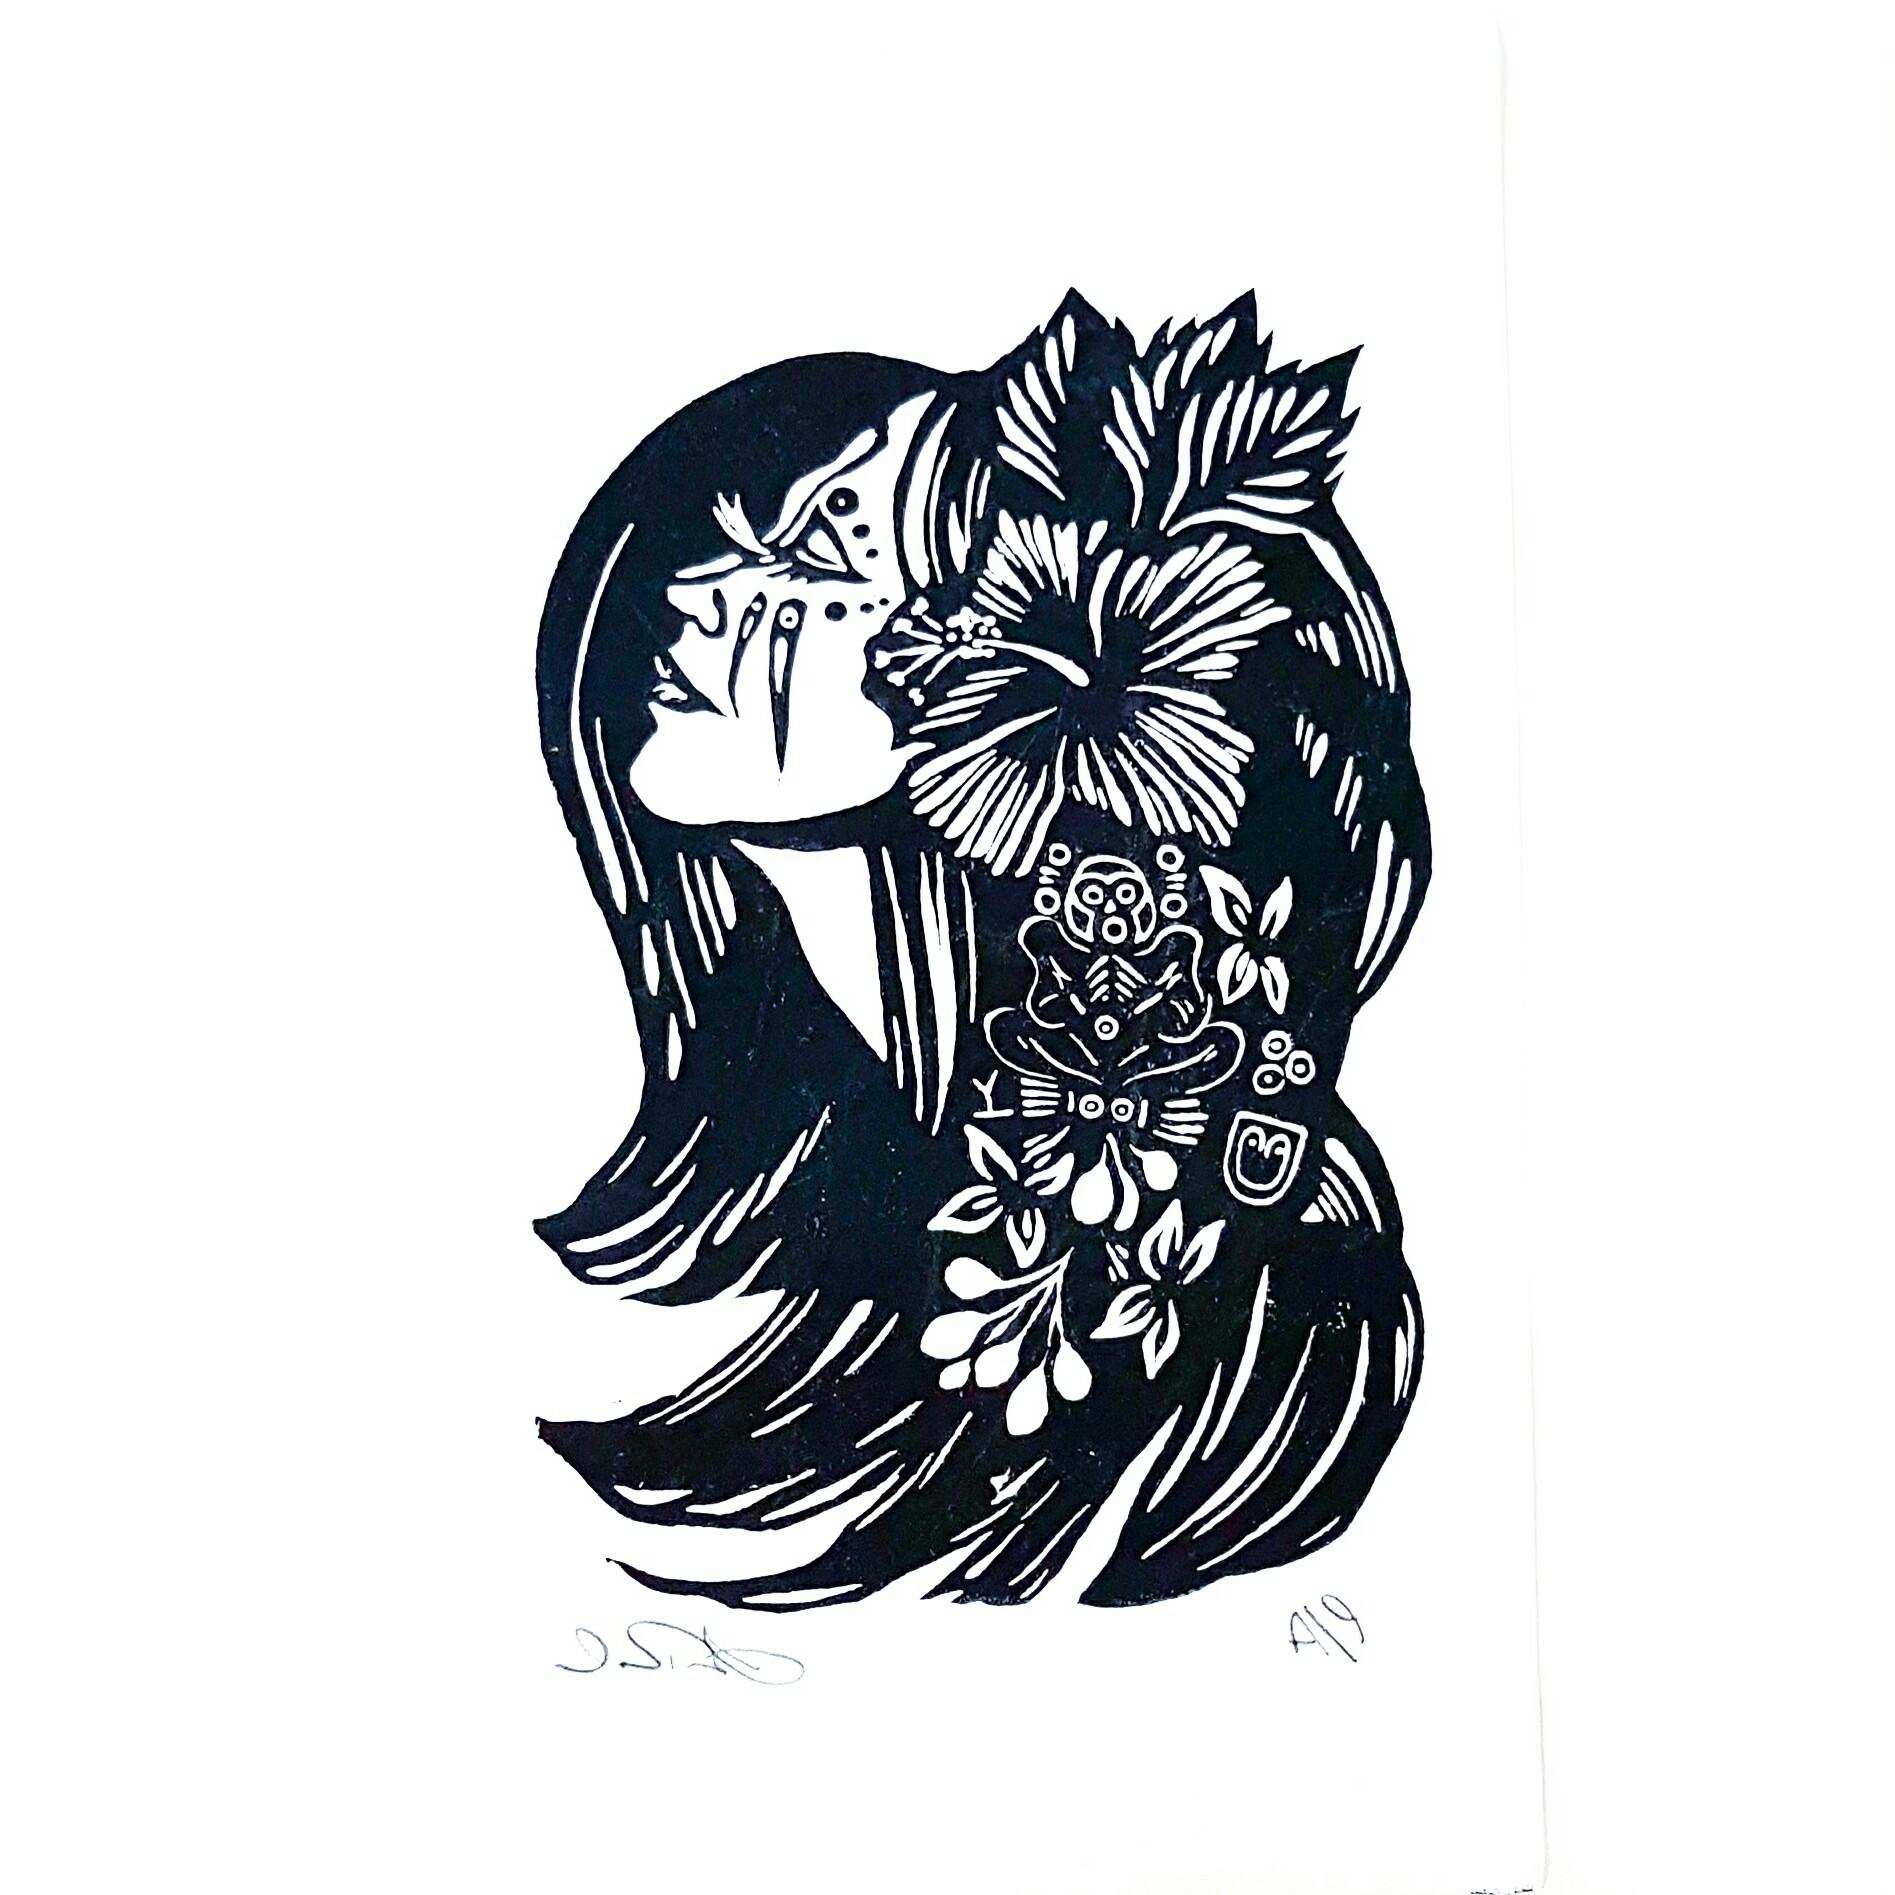 Taino Woman Illustration Inspired On Caribbean Native